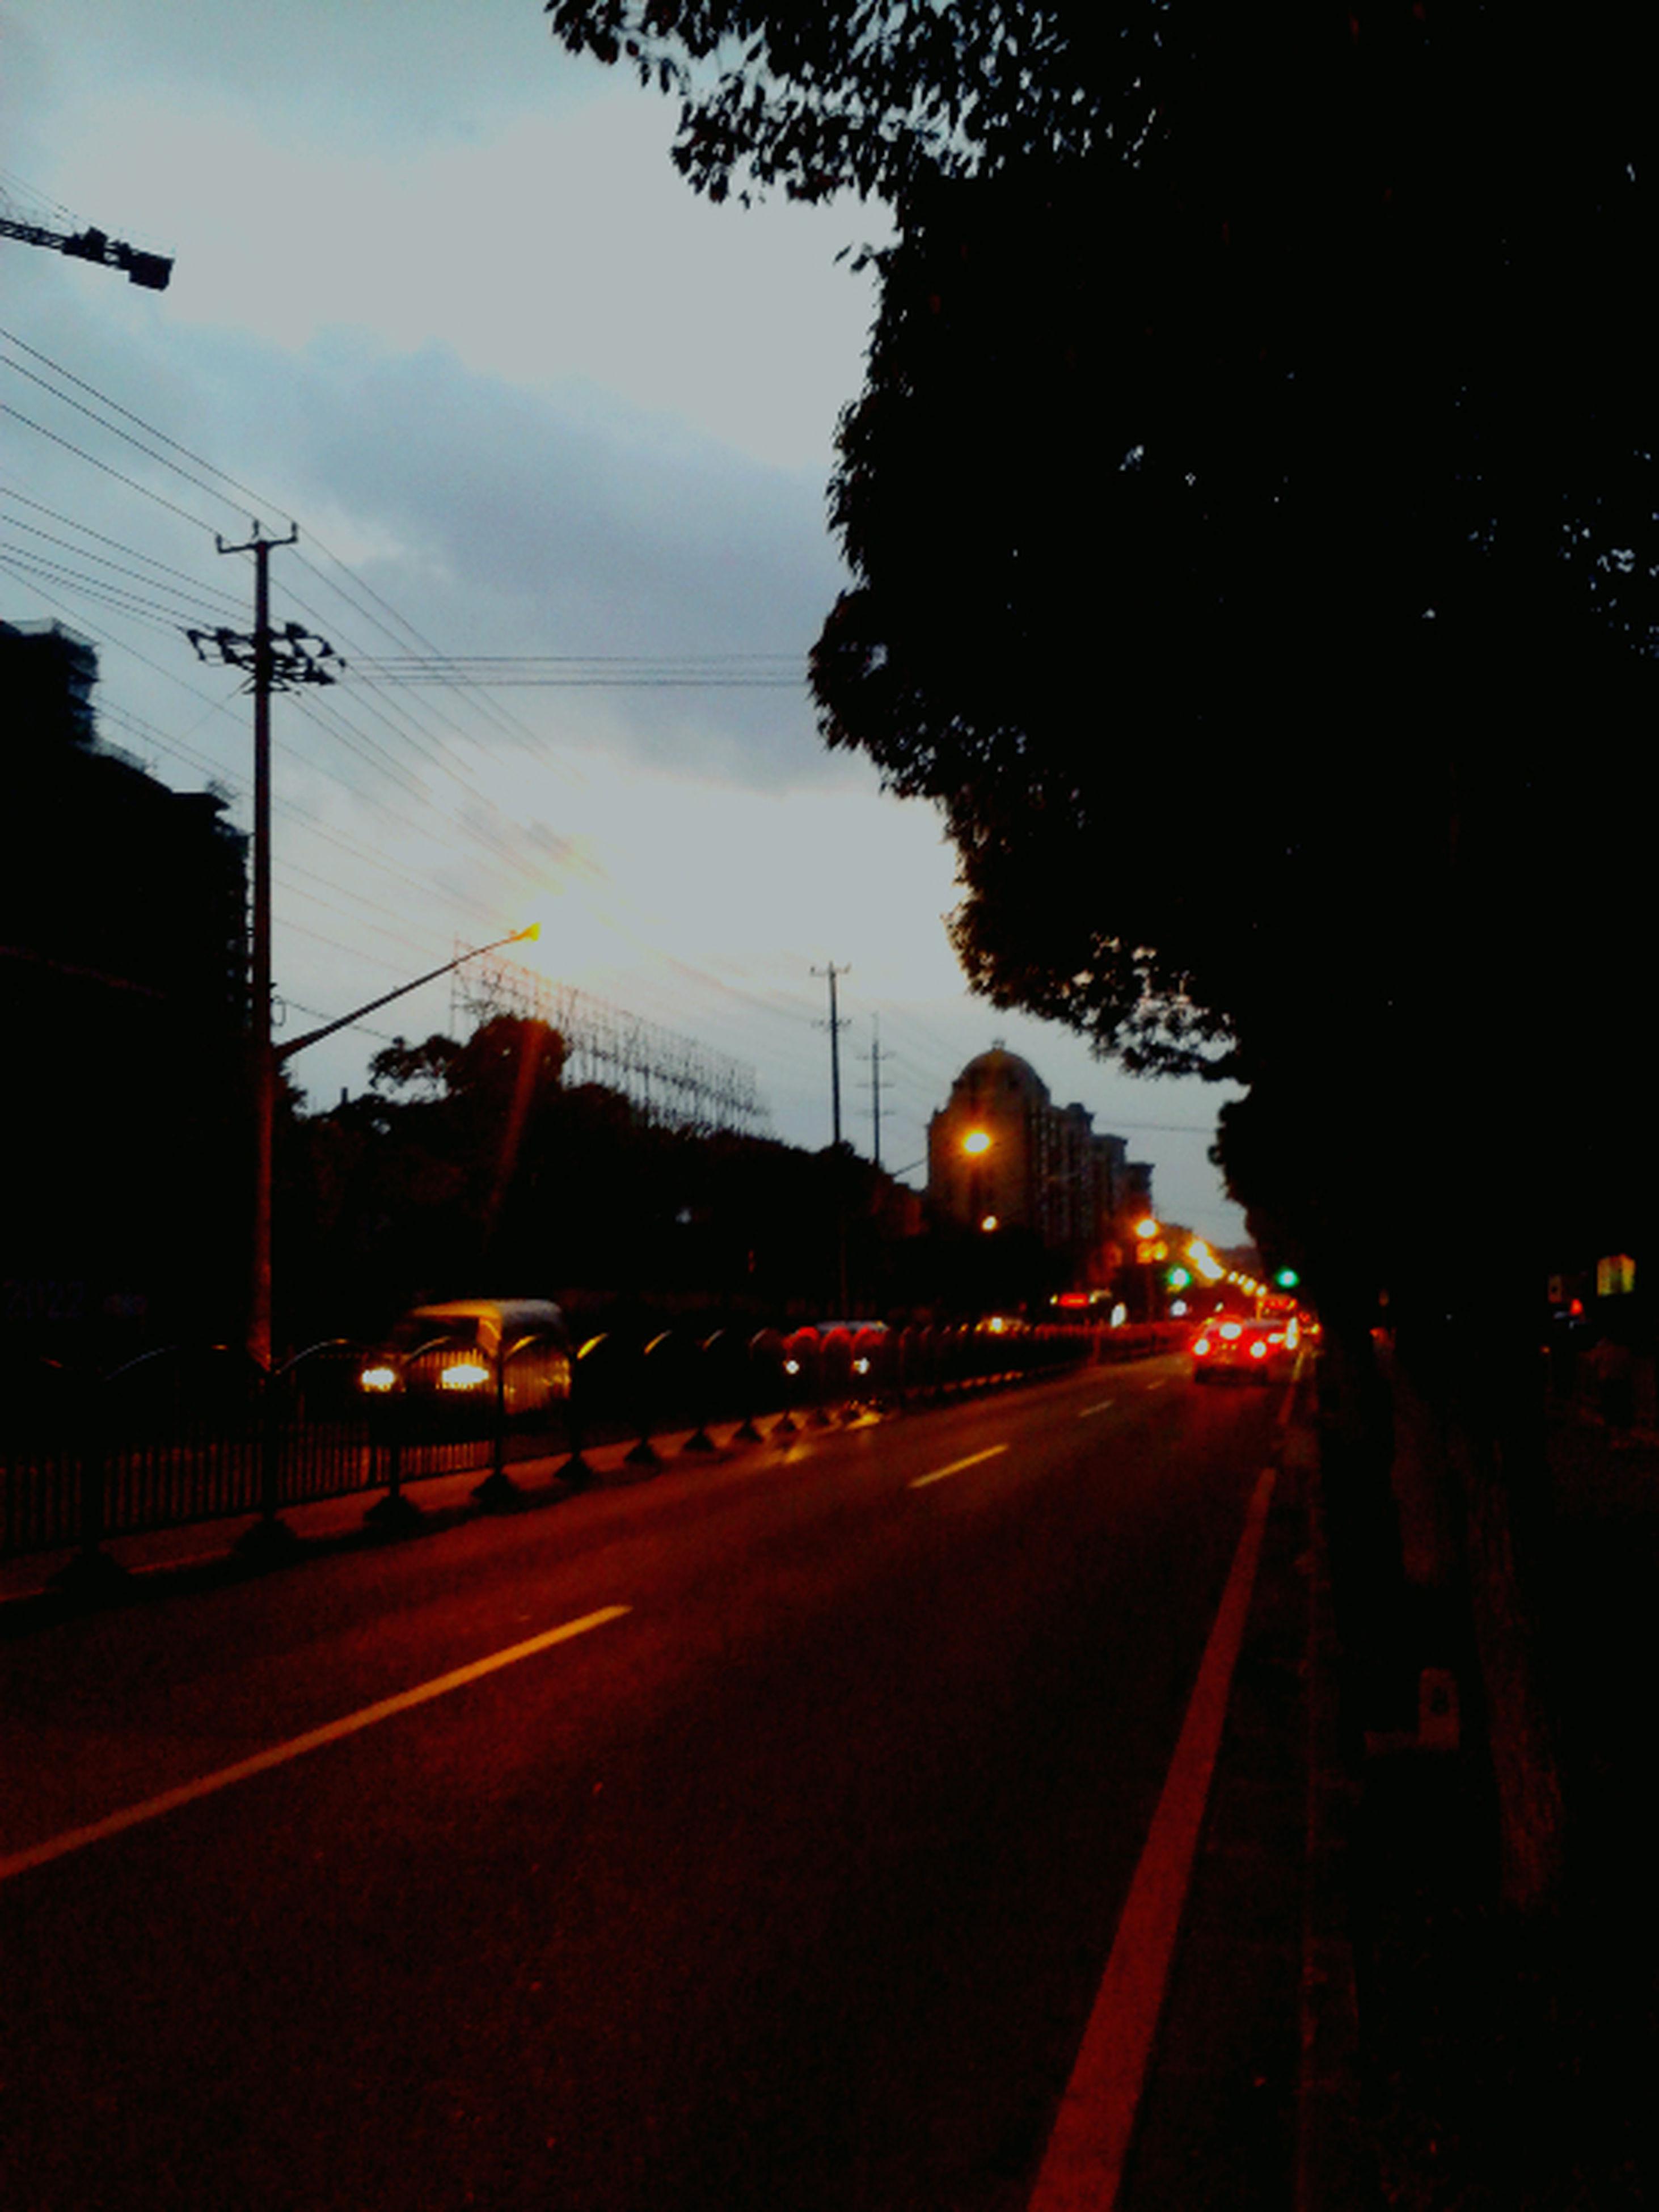 transportation, mode of transport, car, land vehicle, road, sky, illuminated, street light, street, the way forward, on the move, sunset, silhouette, road marking, dusk, diminishing perspective, tree, traffic, electricity pylon, power line